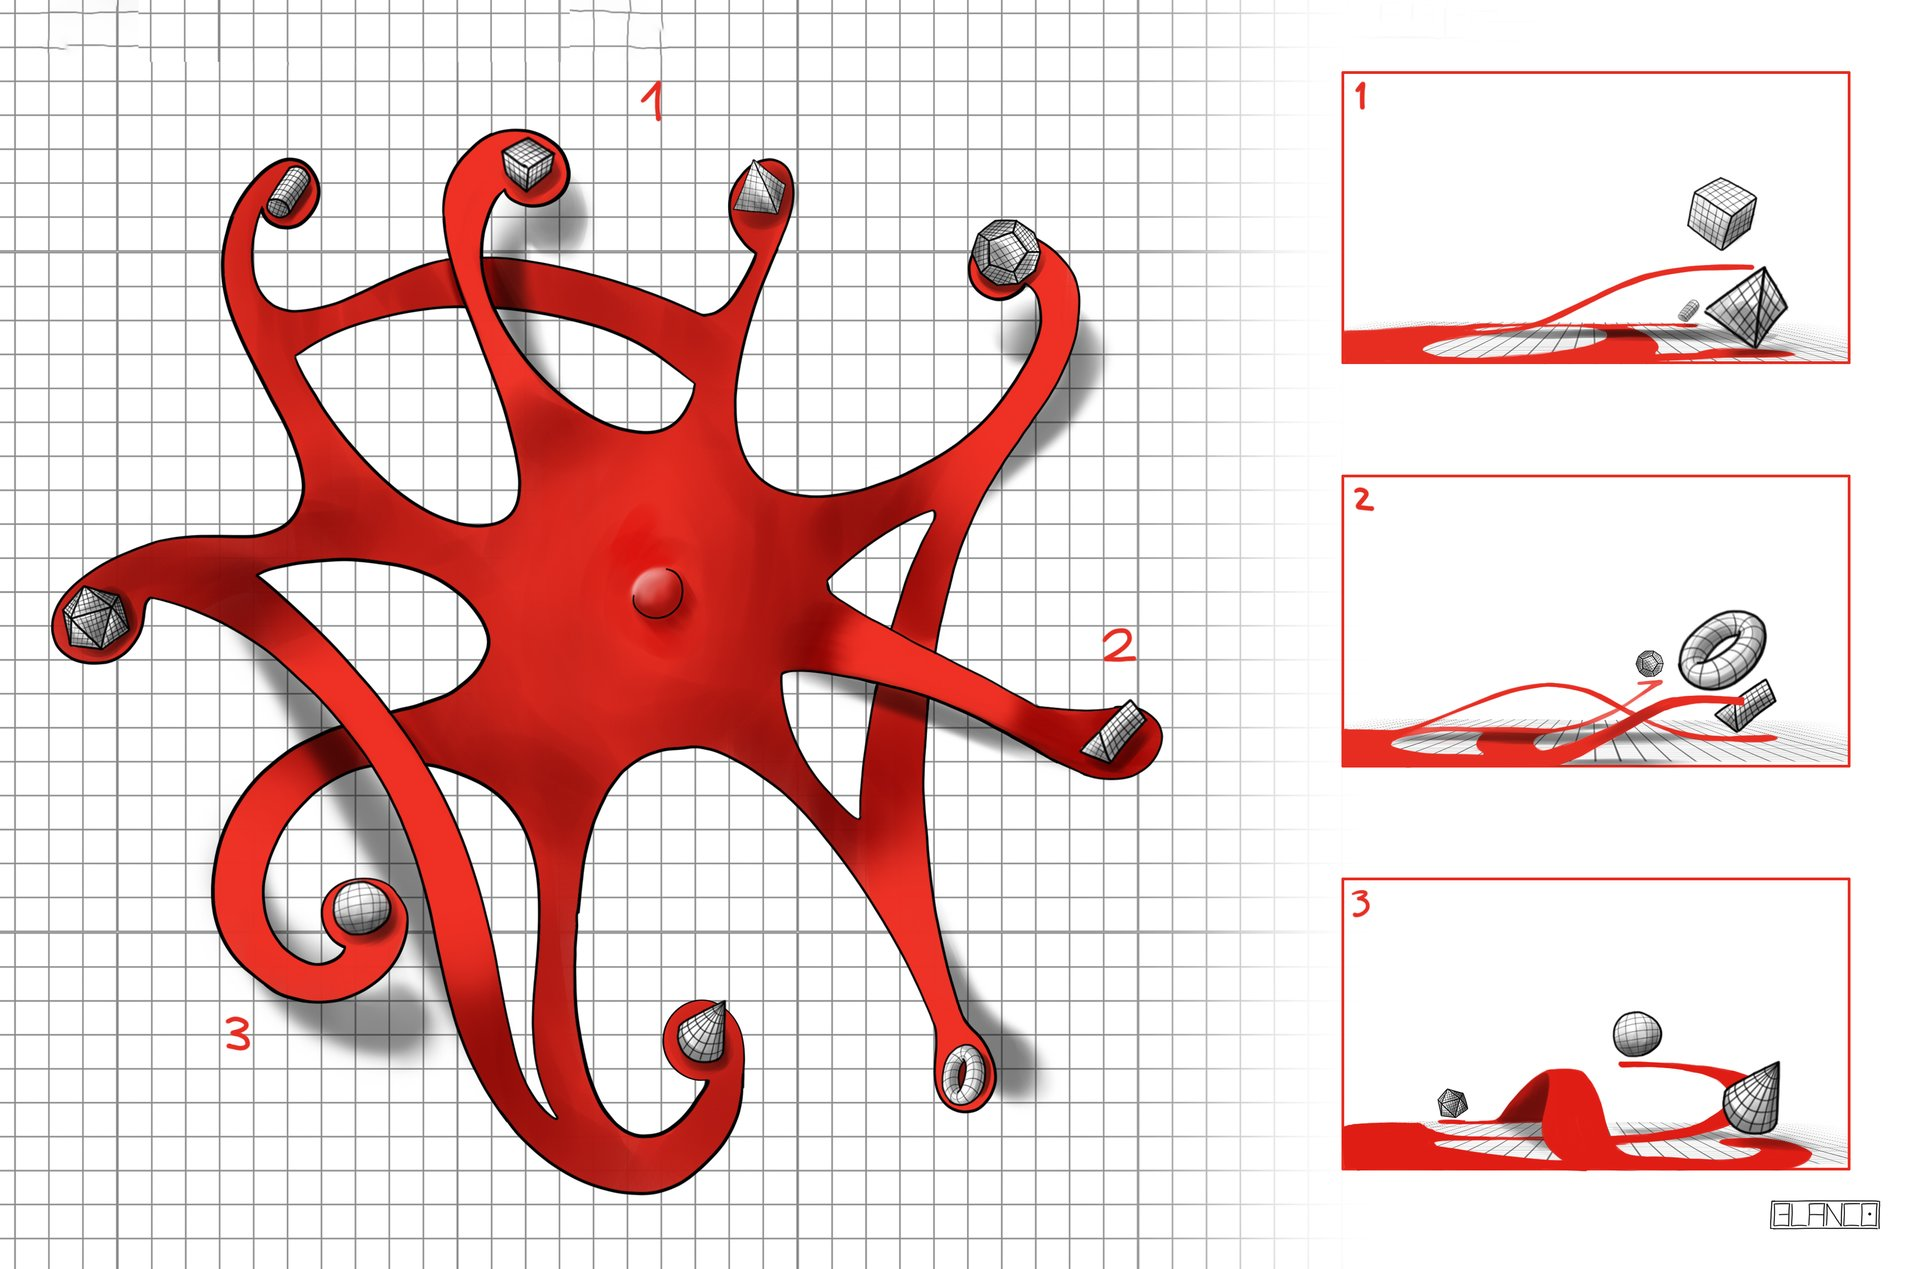 Felipe blanco desenho de conceito neuronio topo